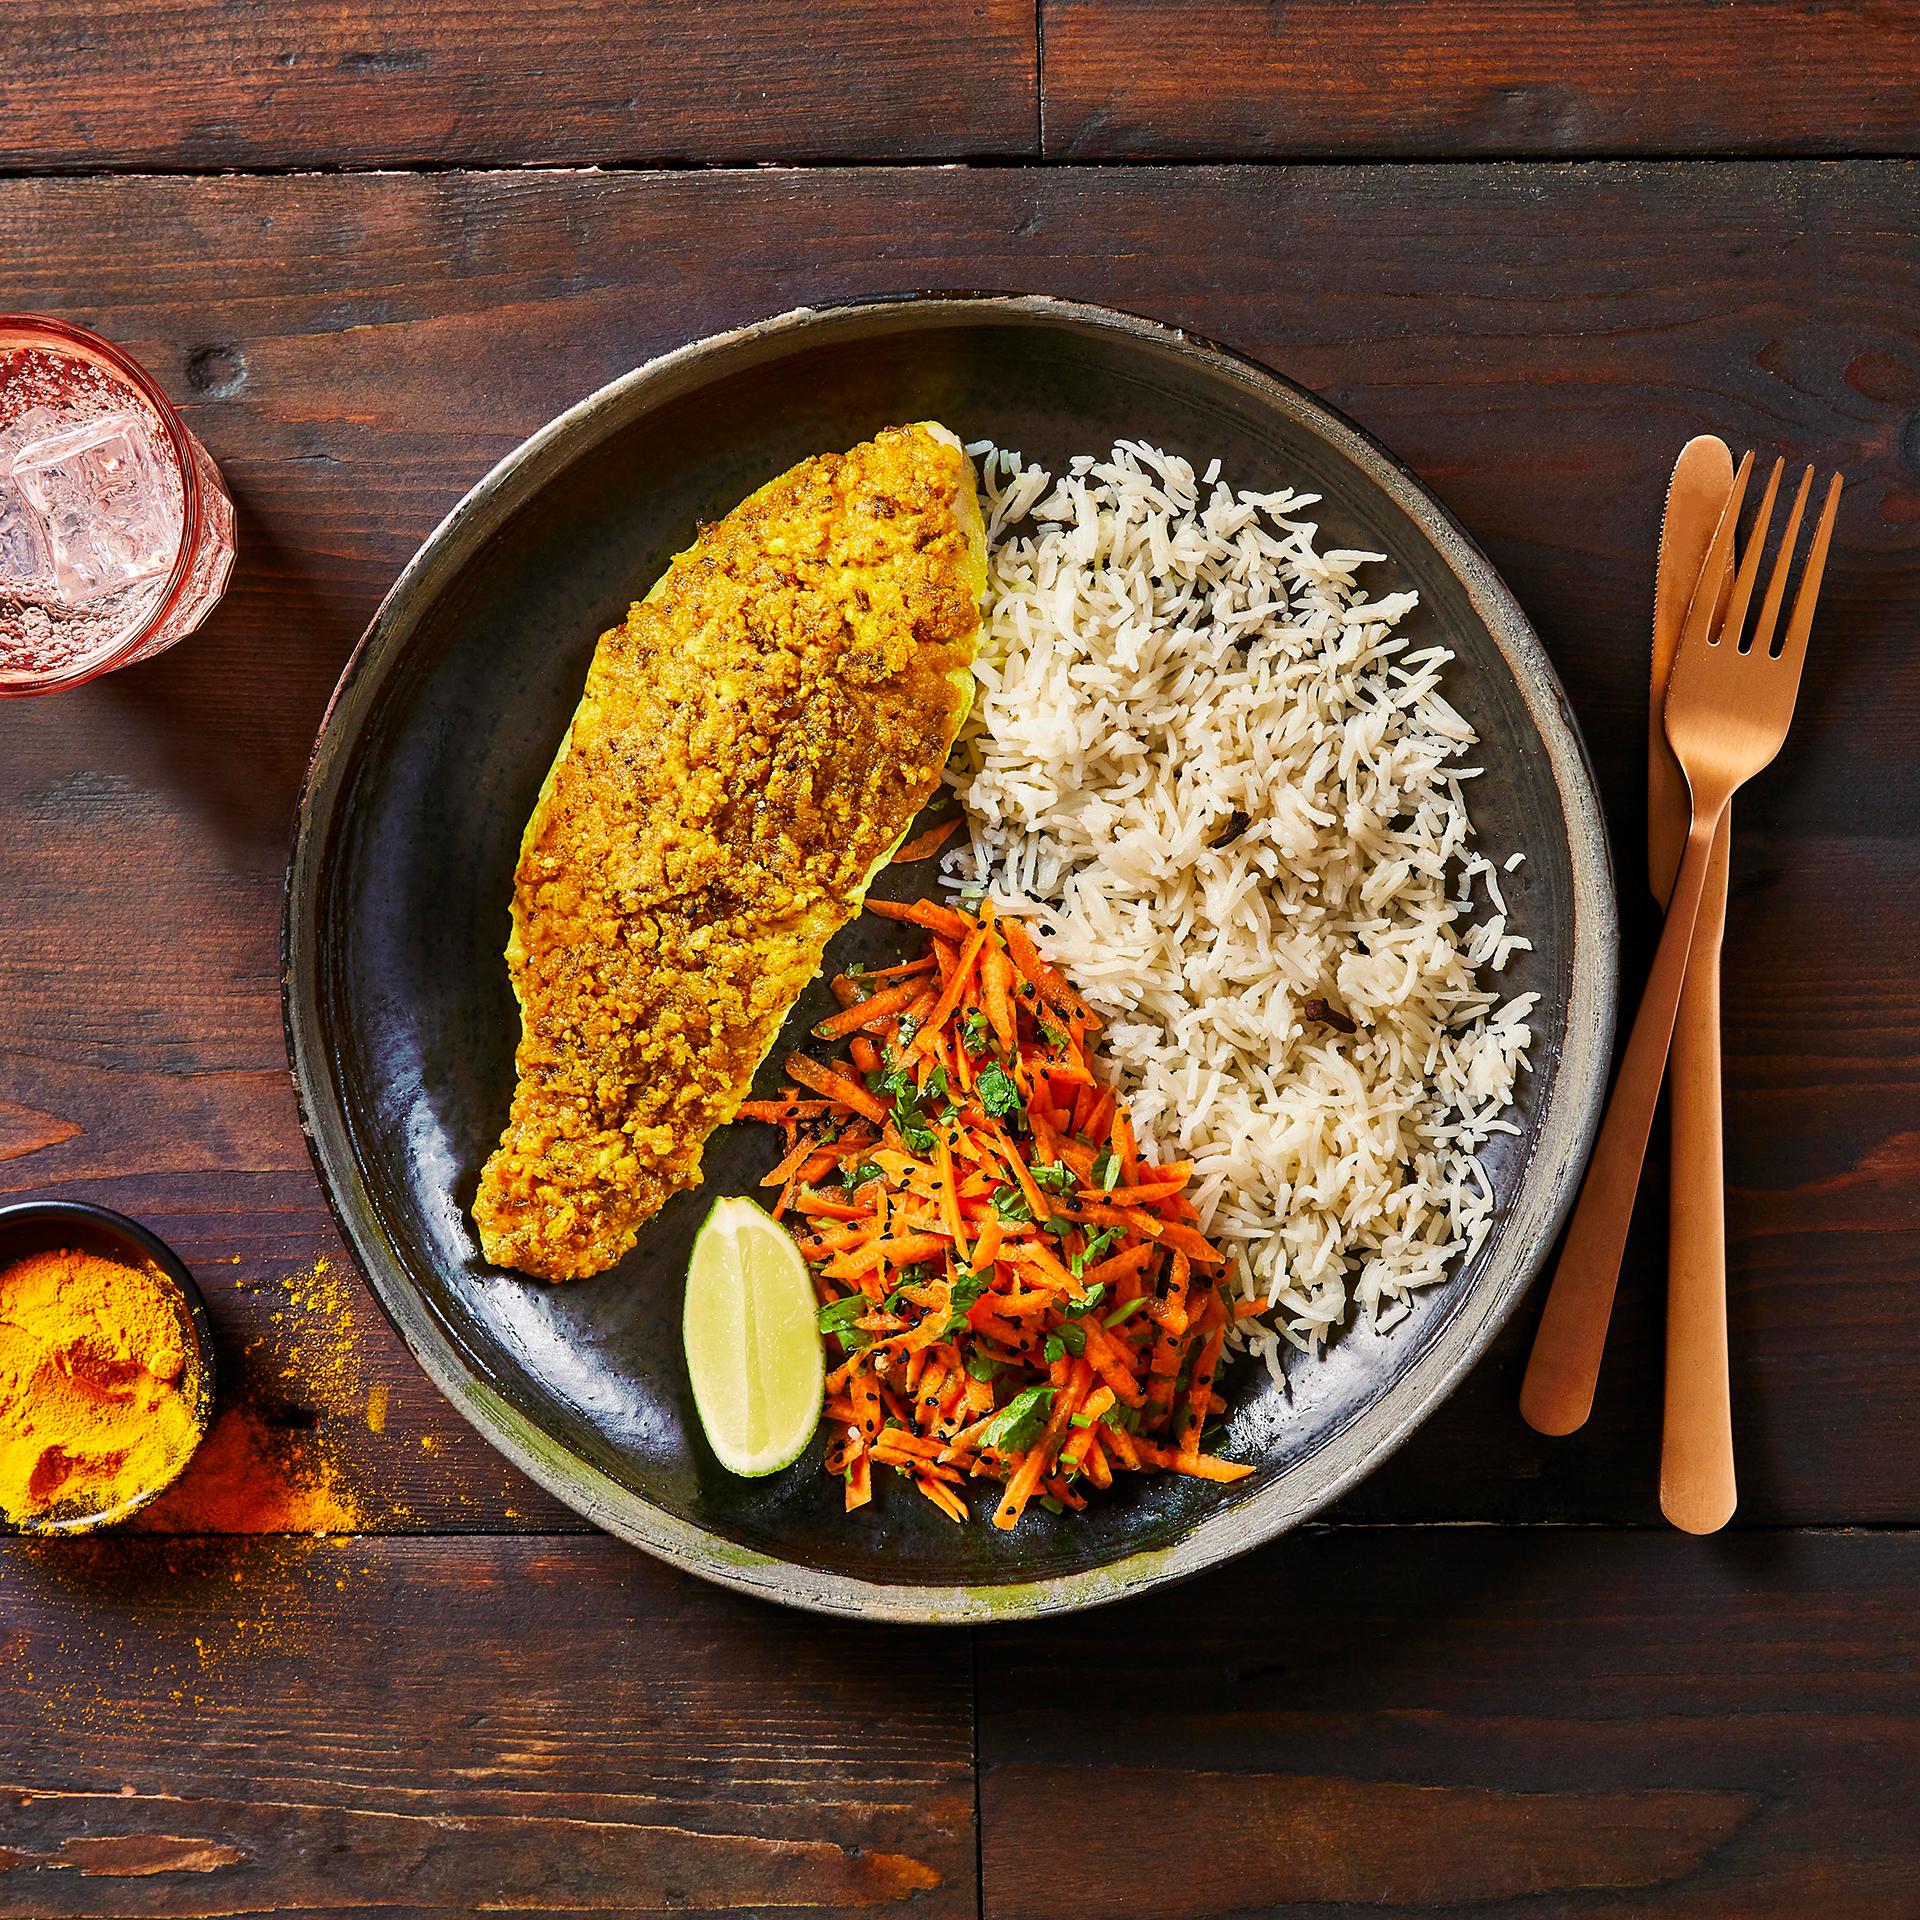 Bengali Mustard Fish With Fragrant Rice